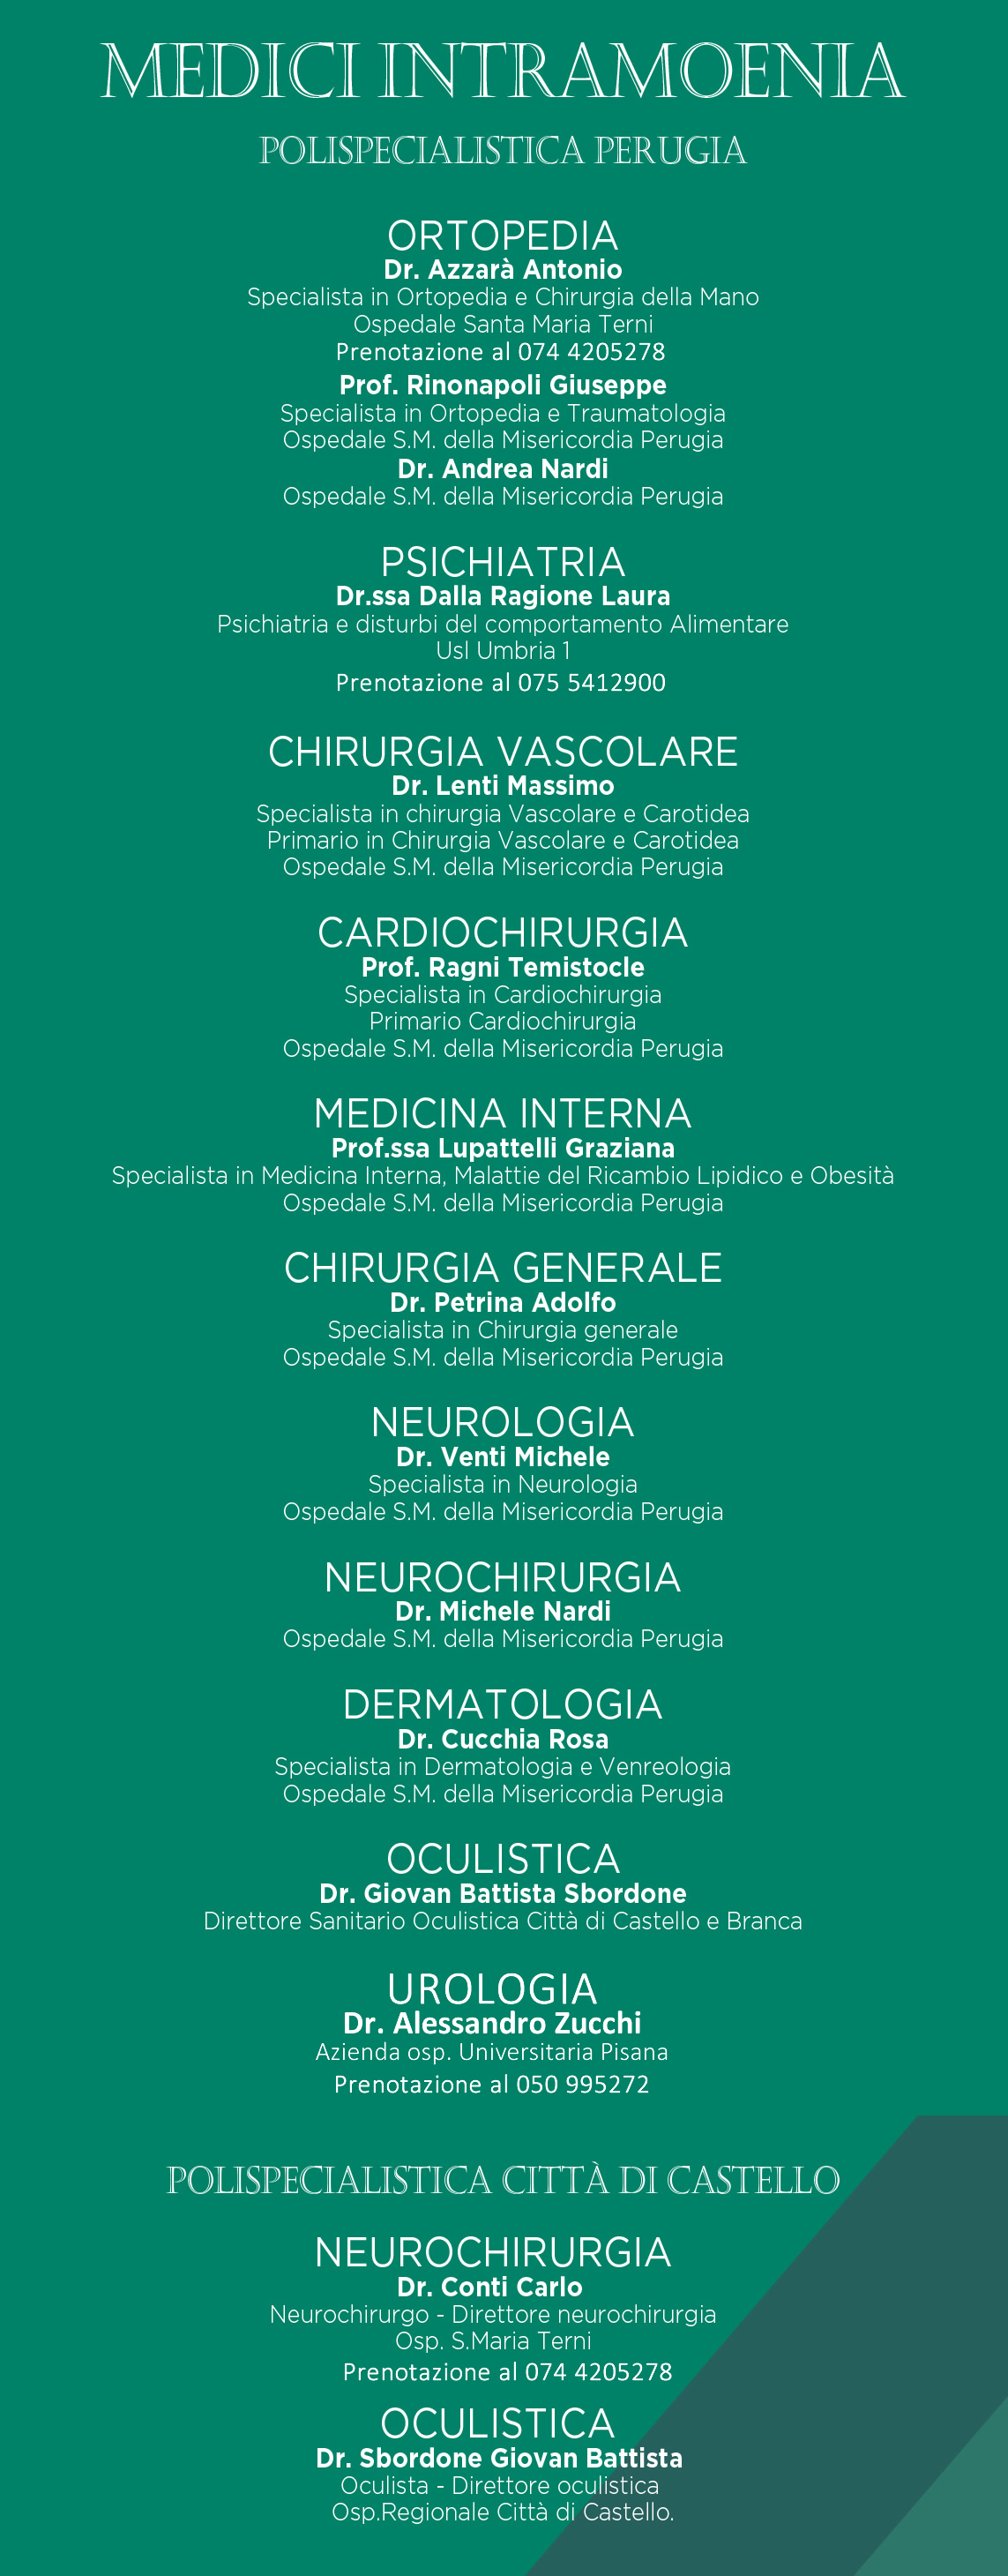 Medici intramoenia Fisiomedical